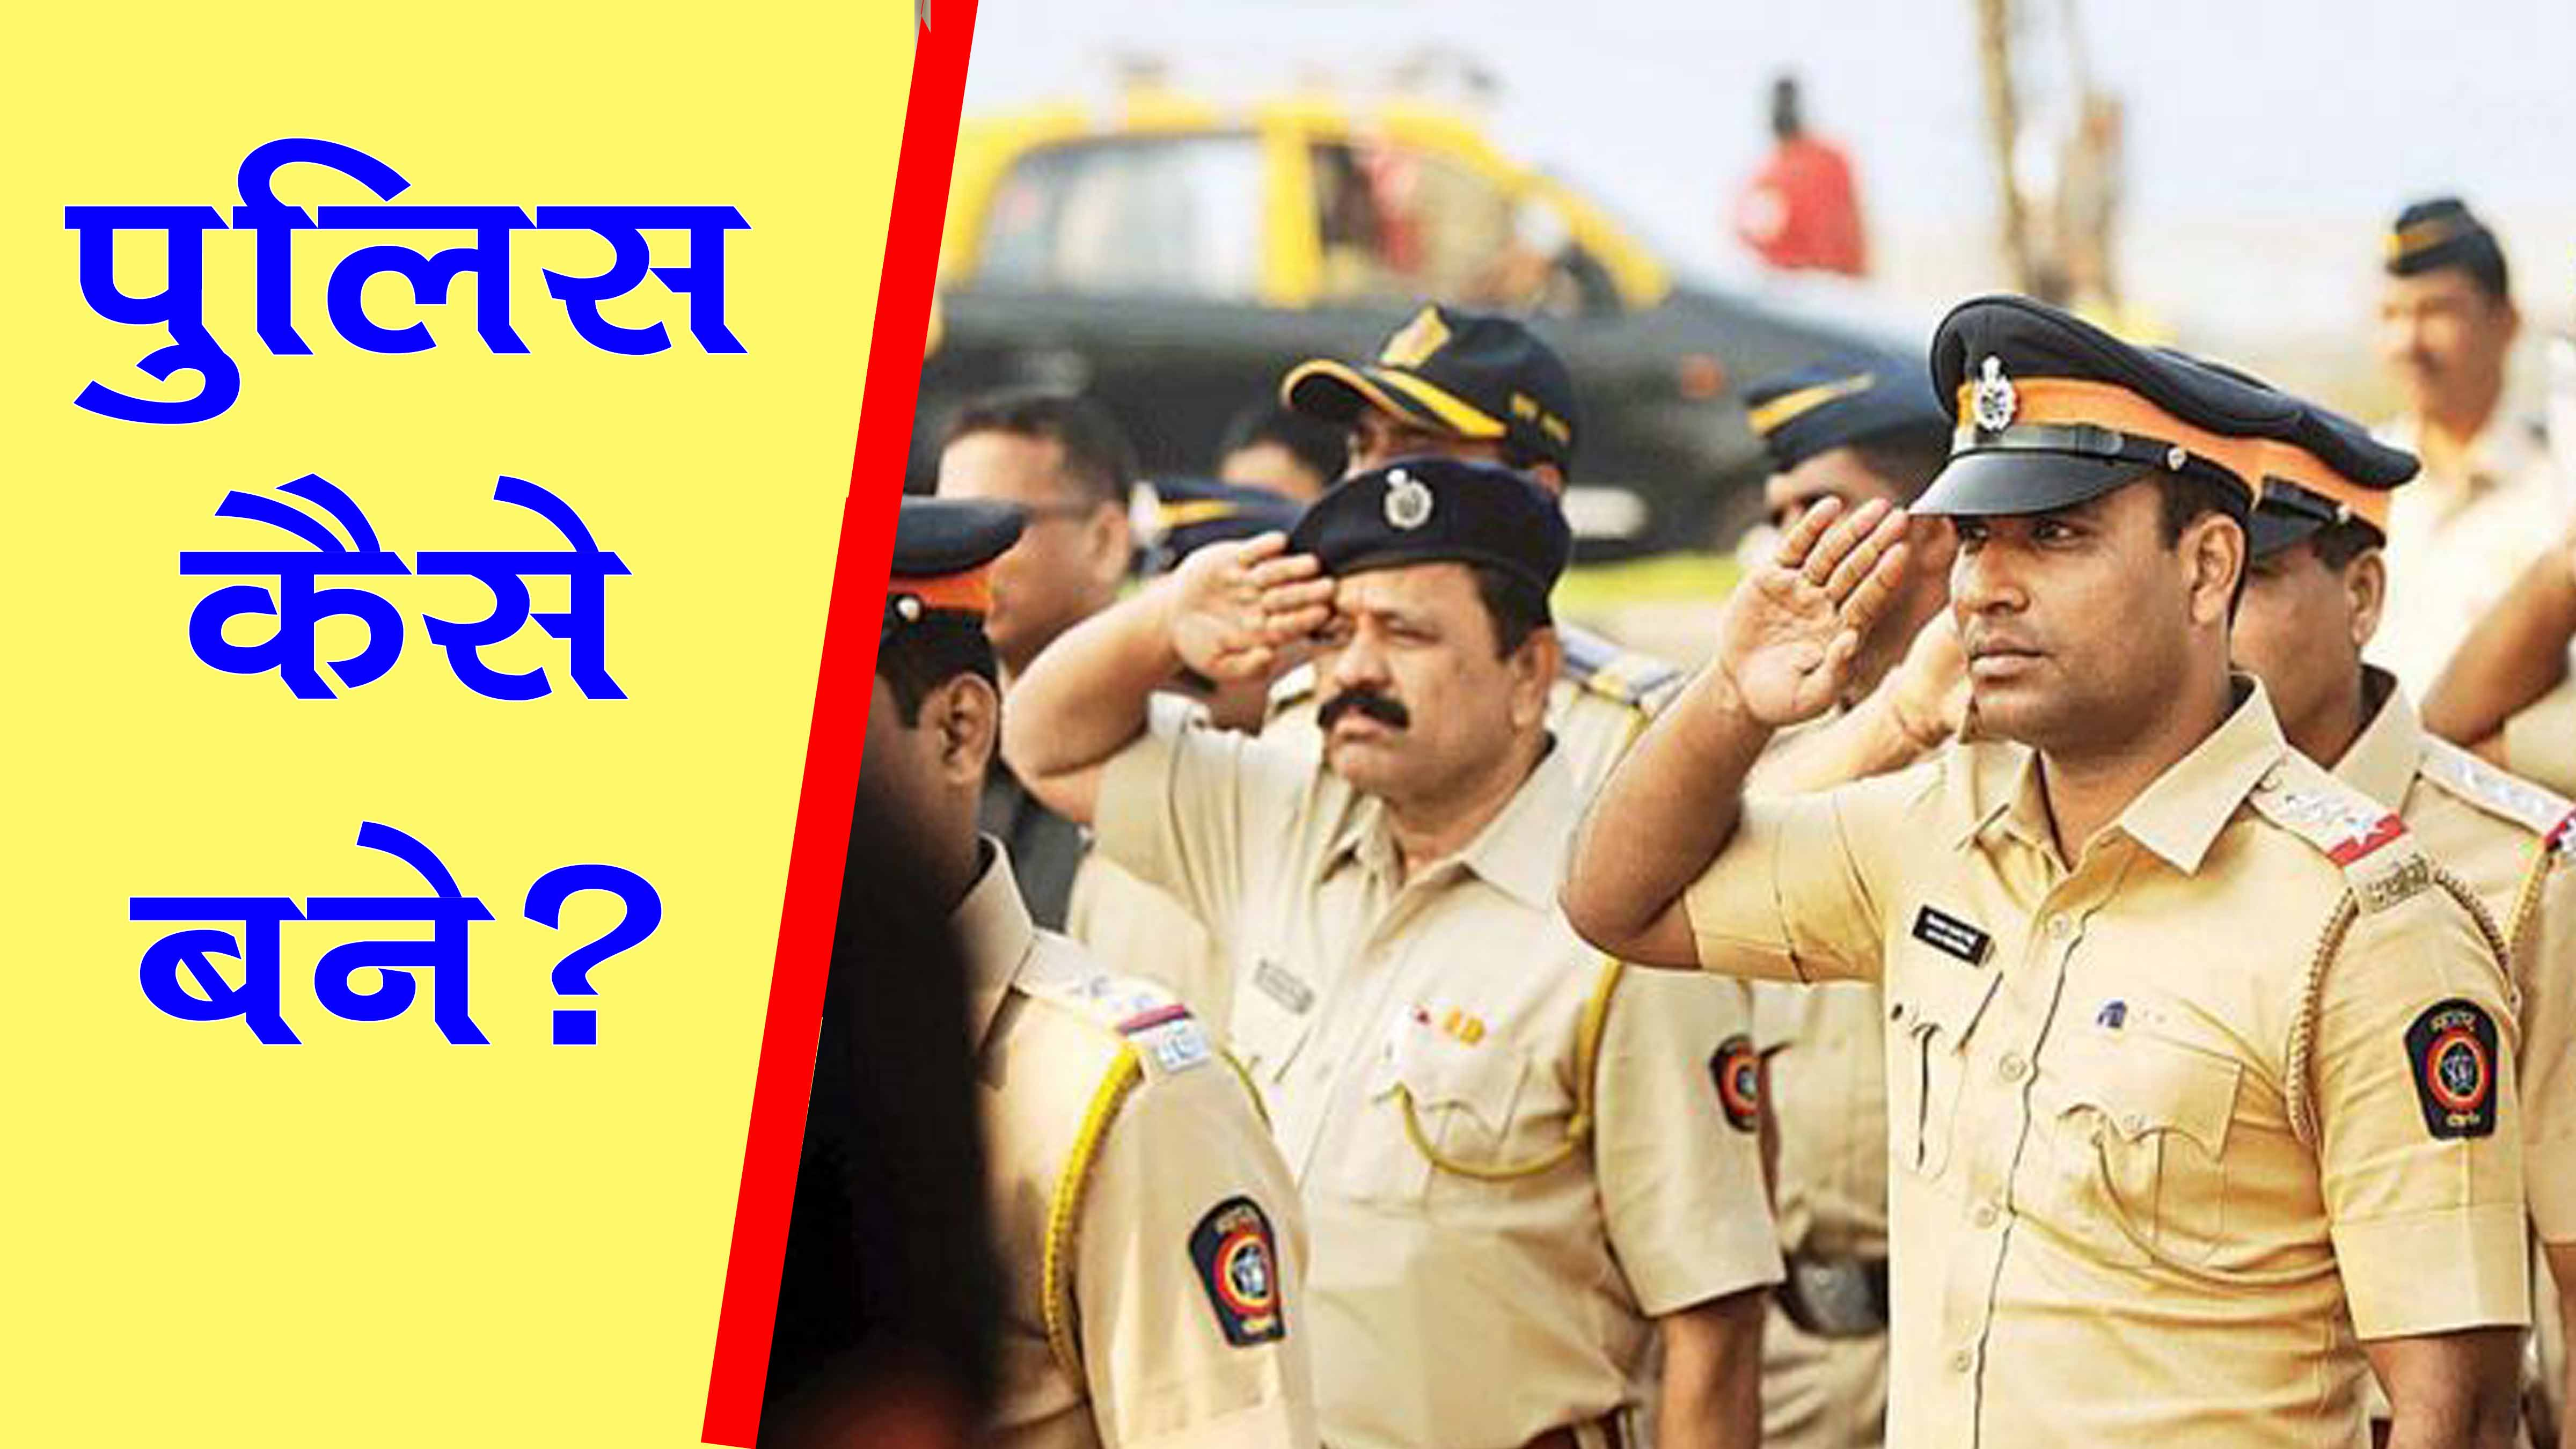 Mahila Police Kaise Bane